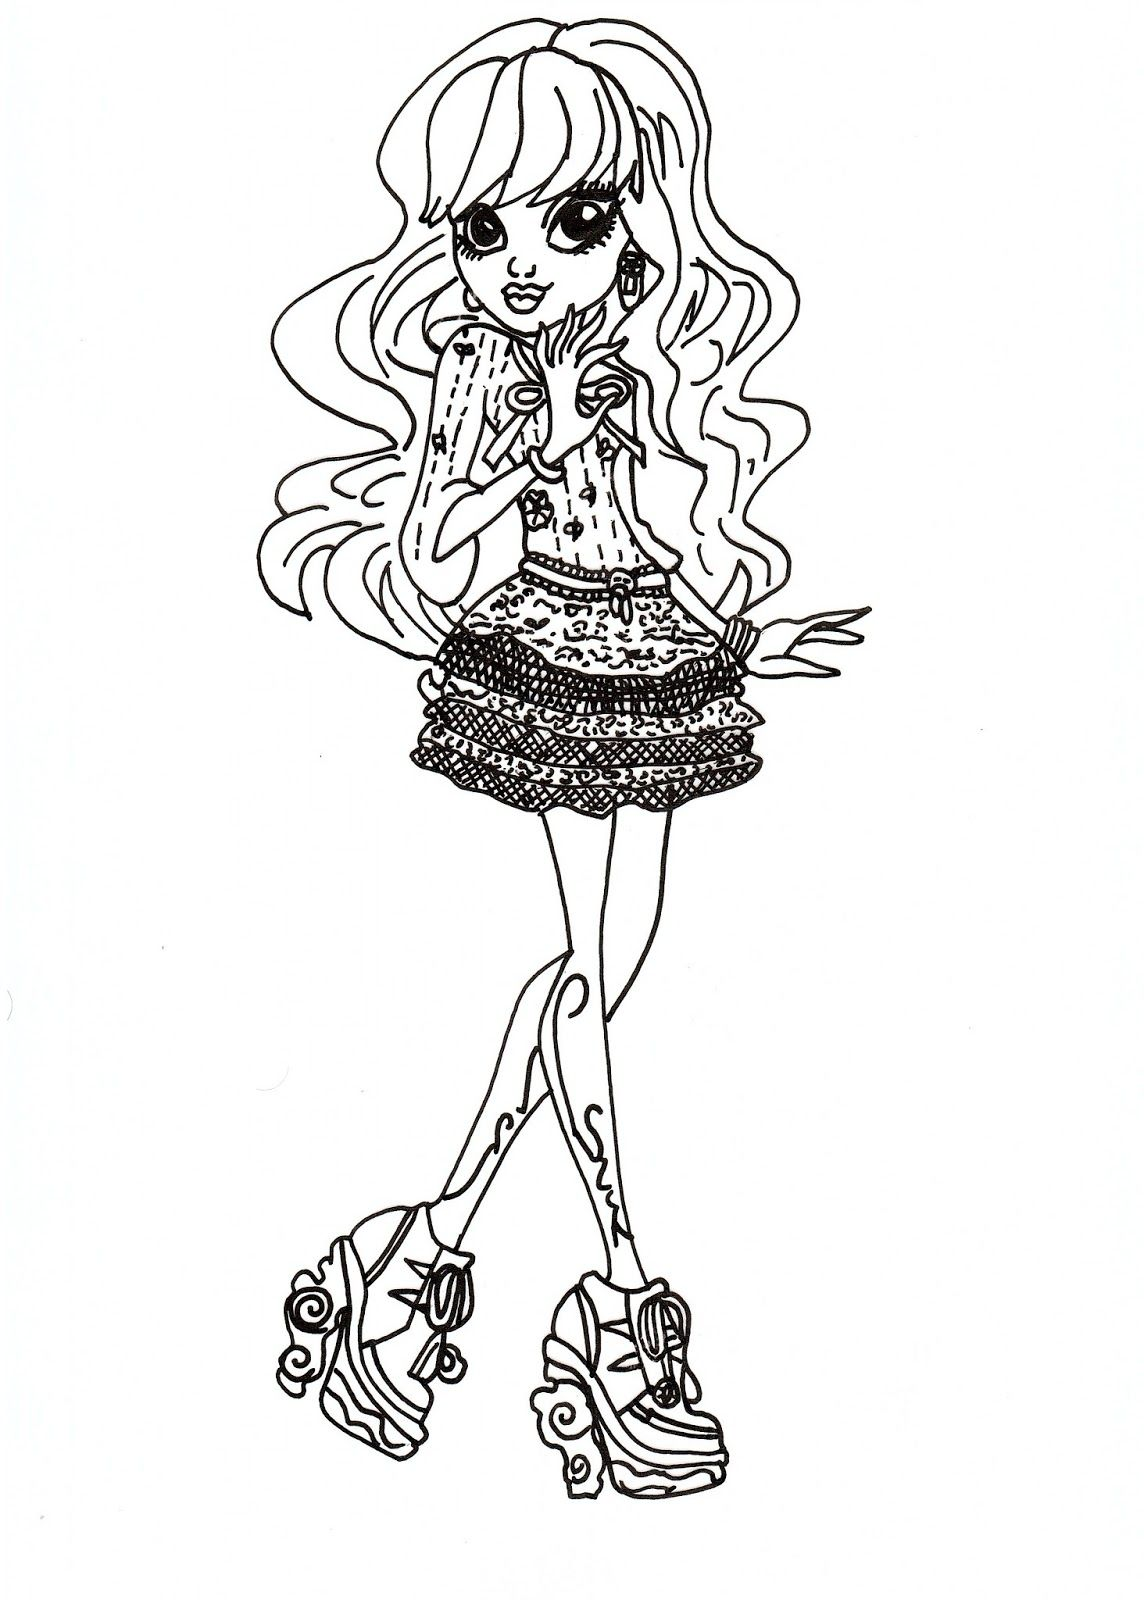 Twyla Coloring Sheet Jpg 1144 1600 Monster Coloring Pages Cartoon Coloring Pages Coloring Pages